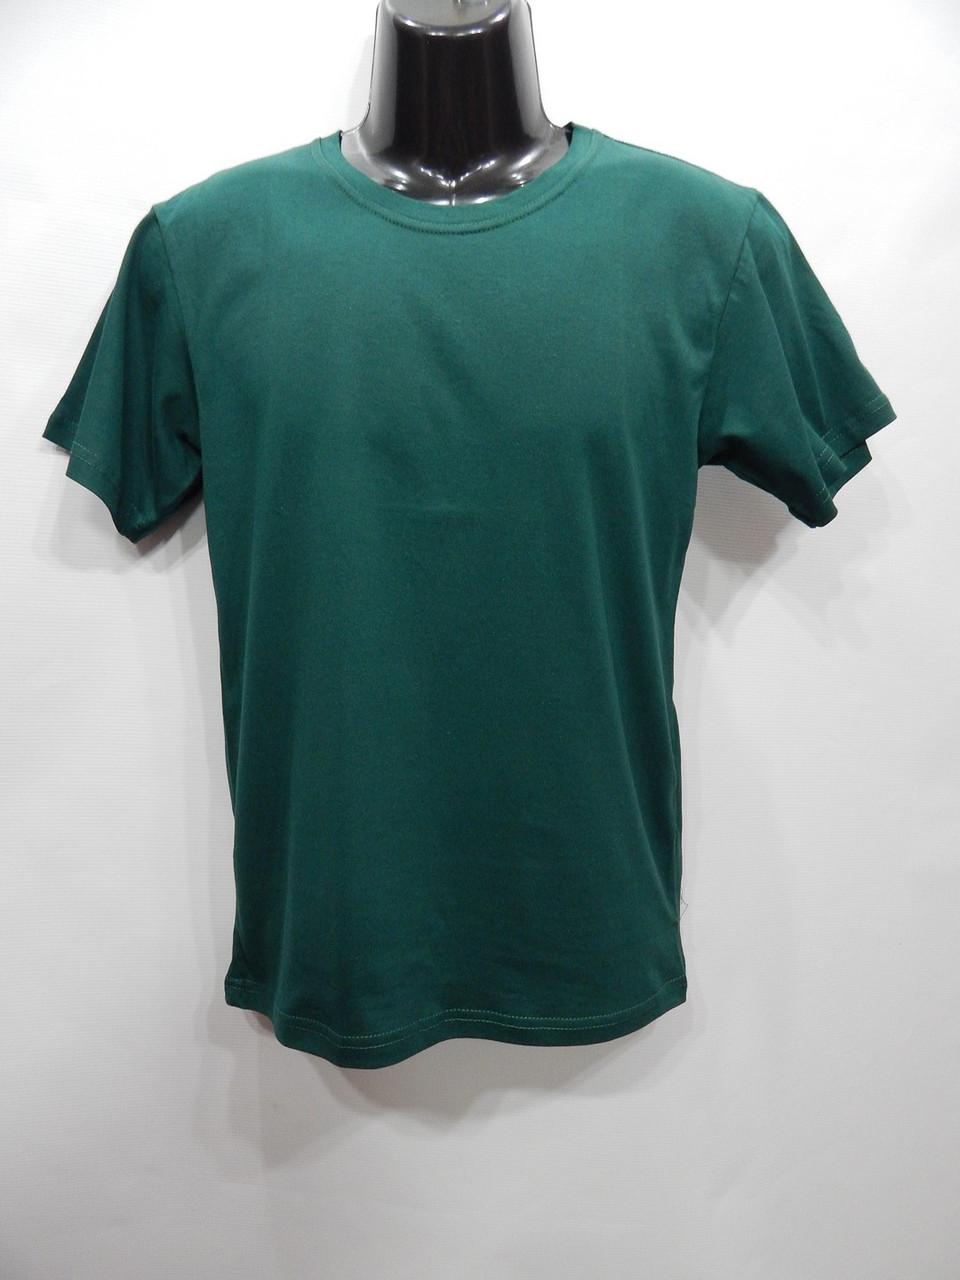 Мужская футболка Mercury-Textile зеленая р.50 066мф